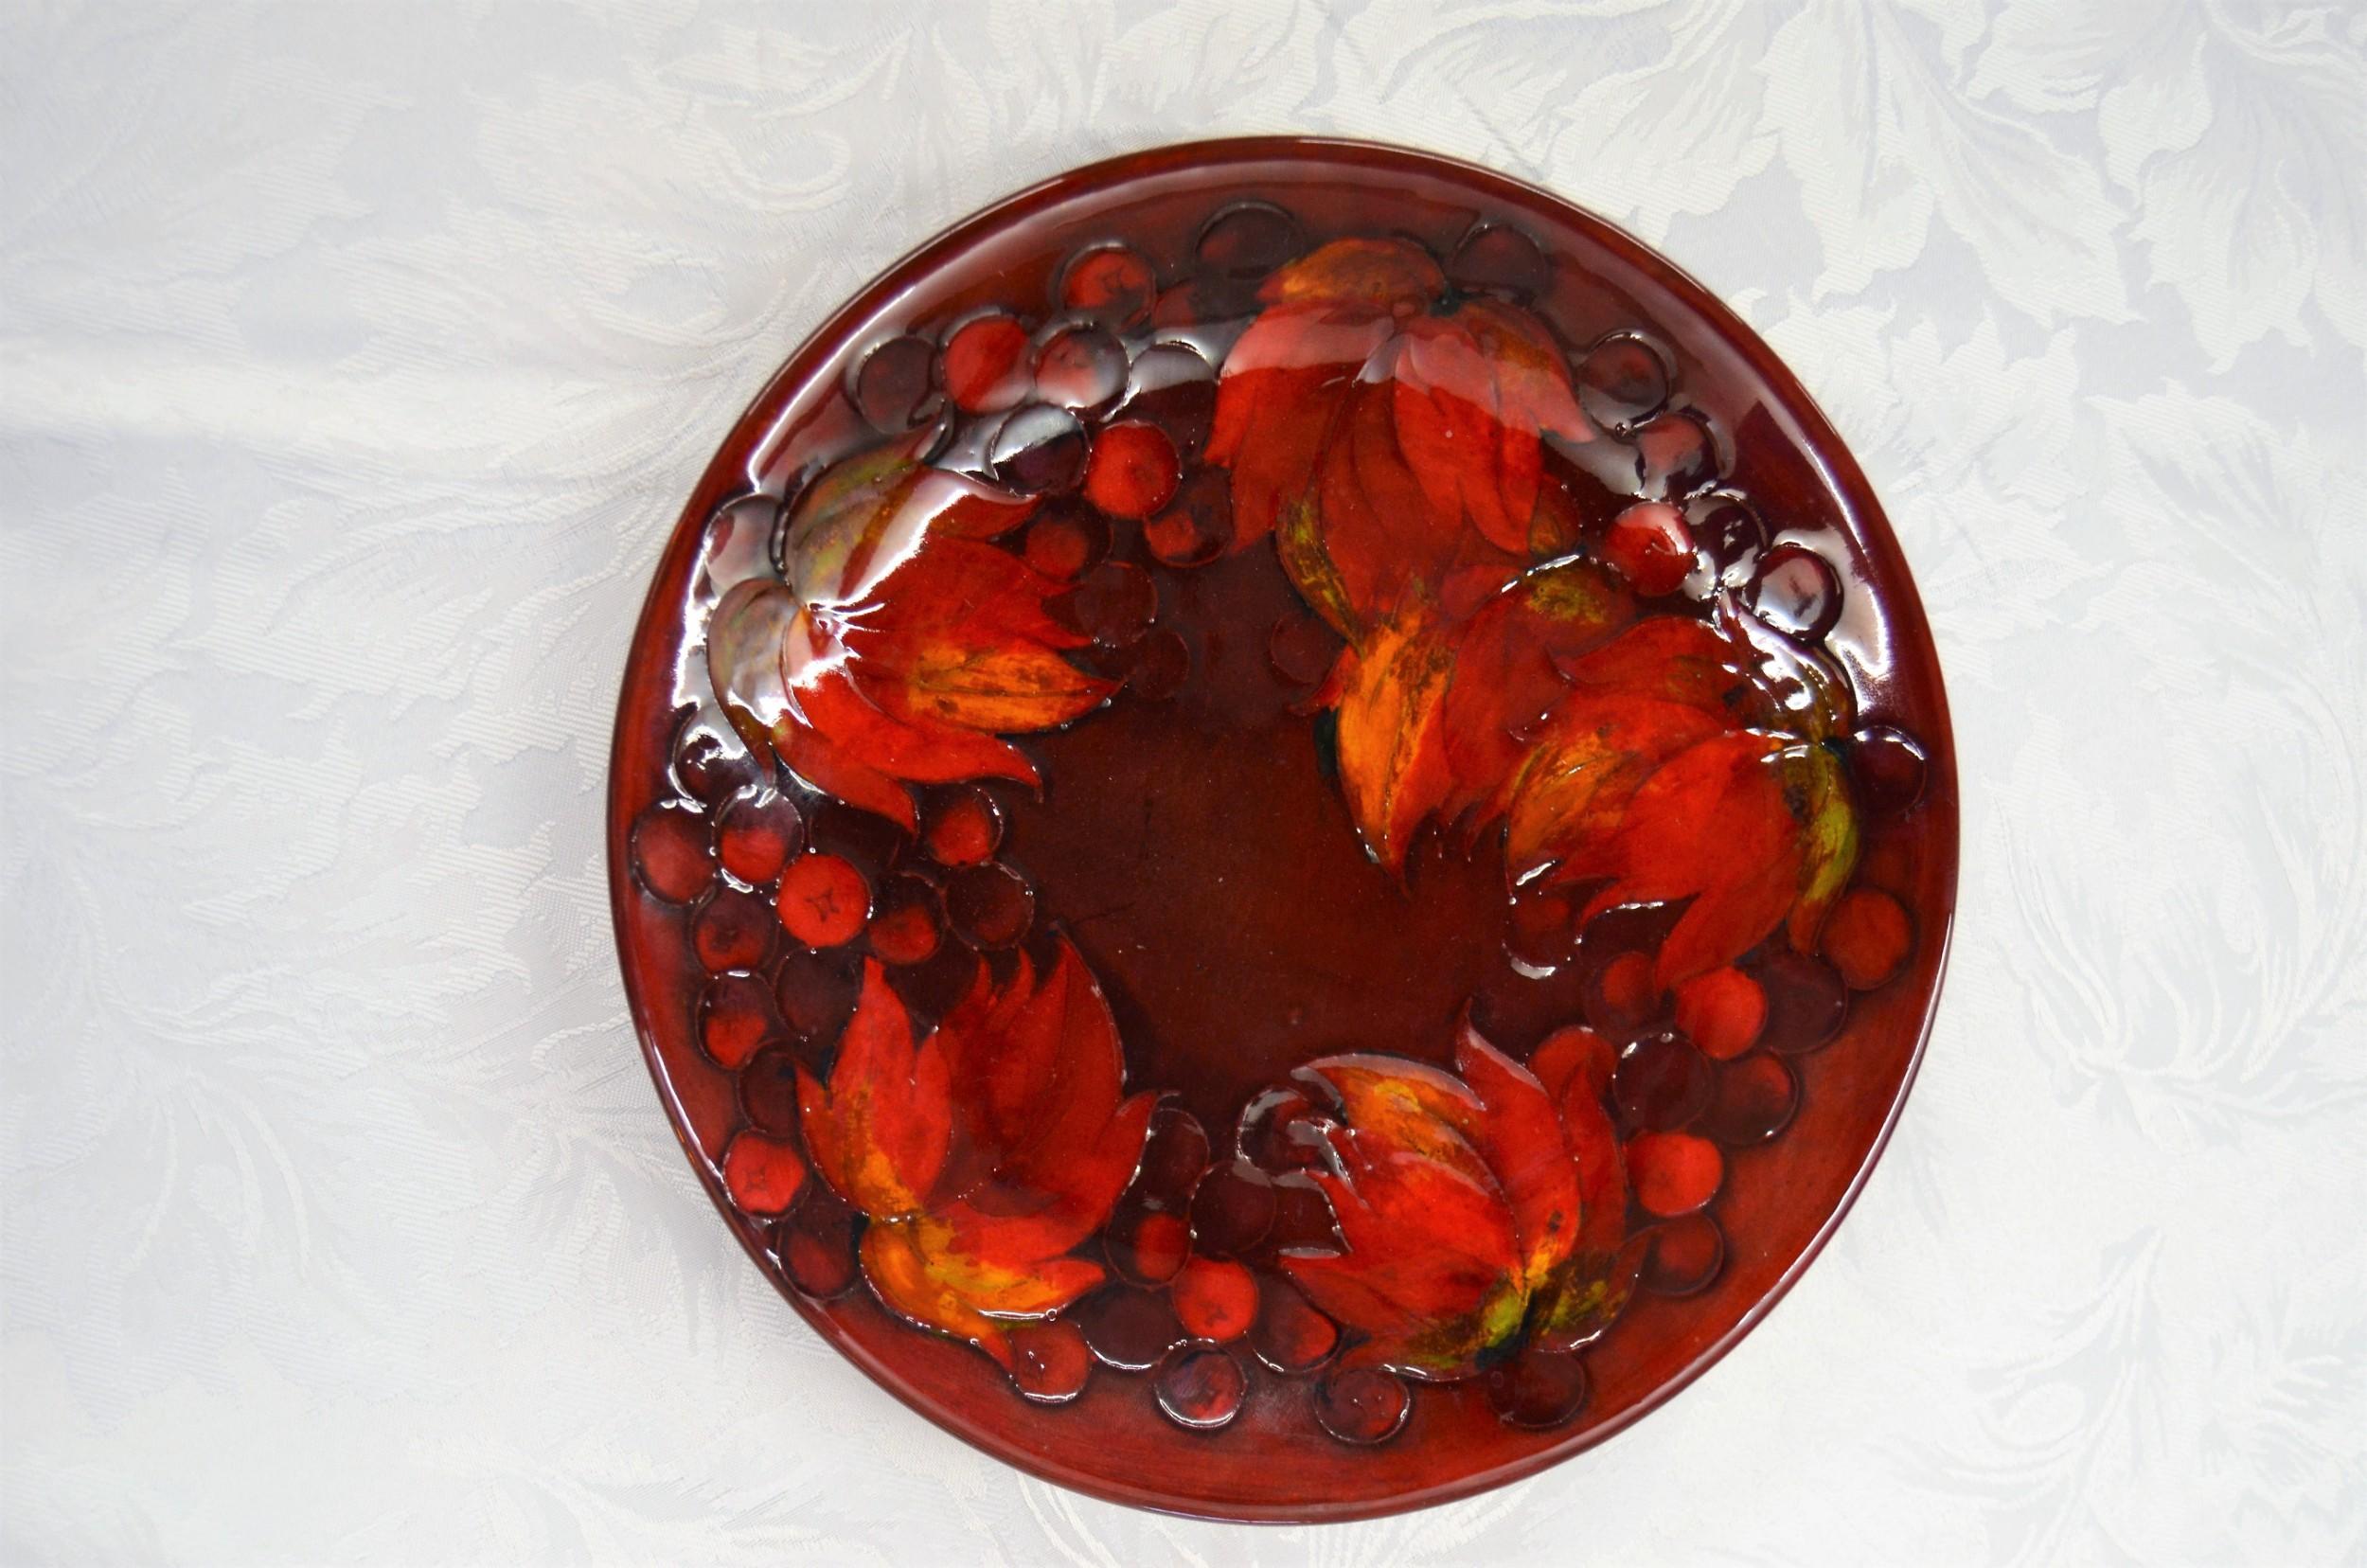 moorecroft flambe porcelain plate